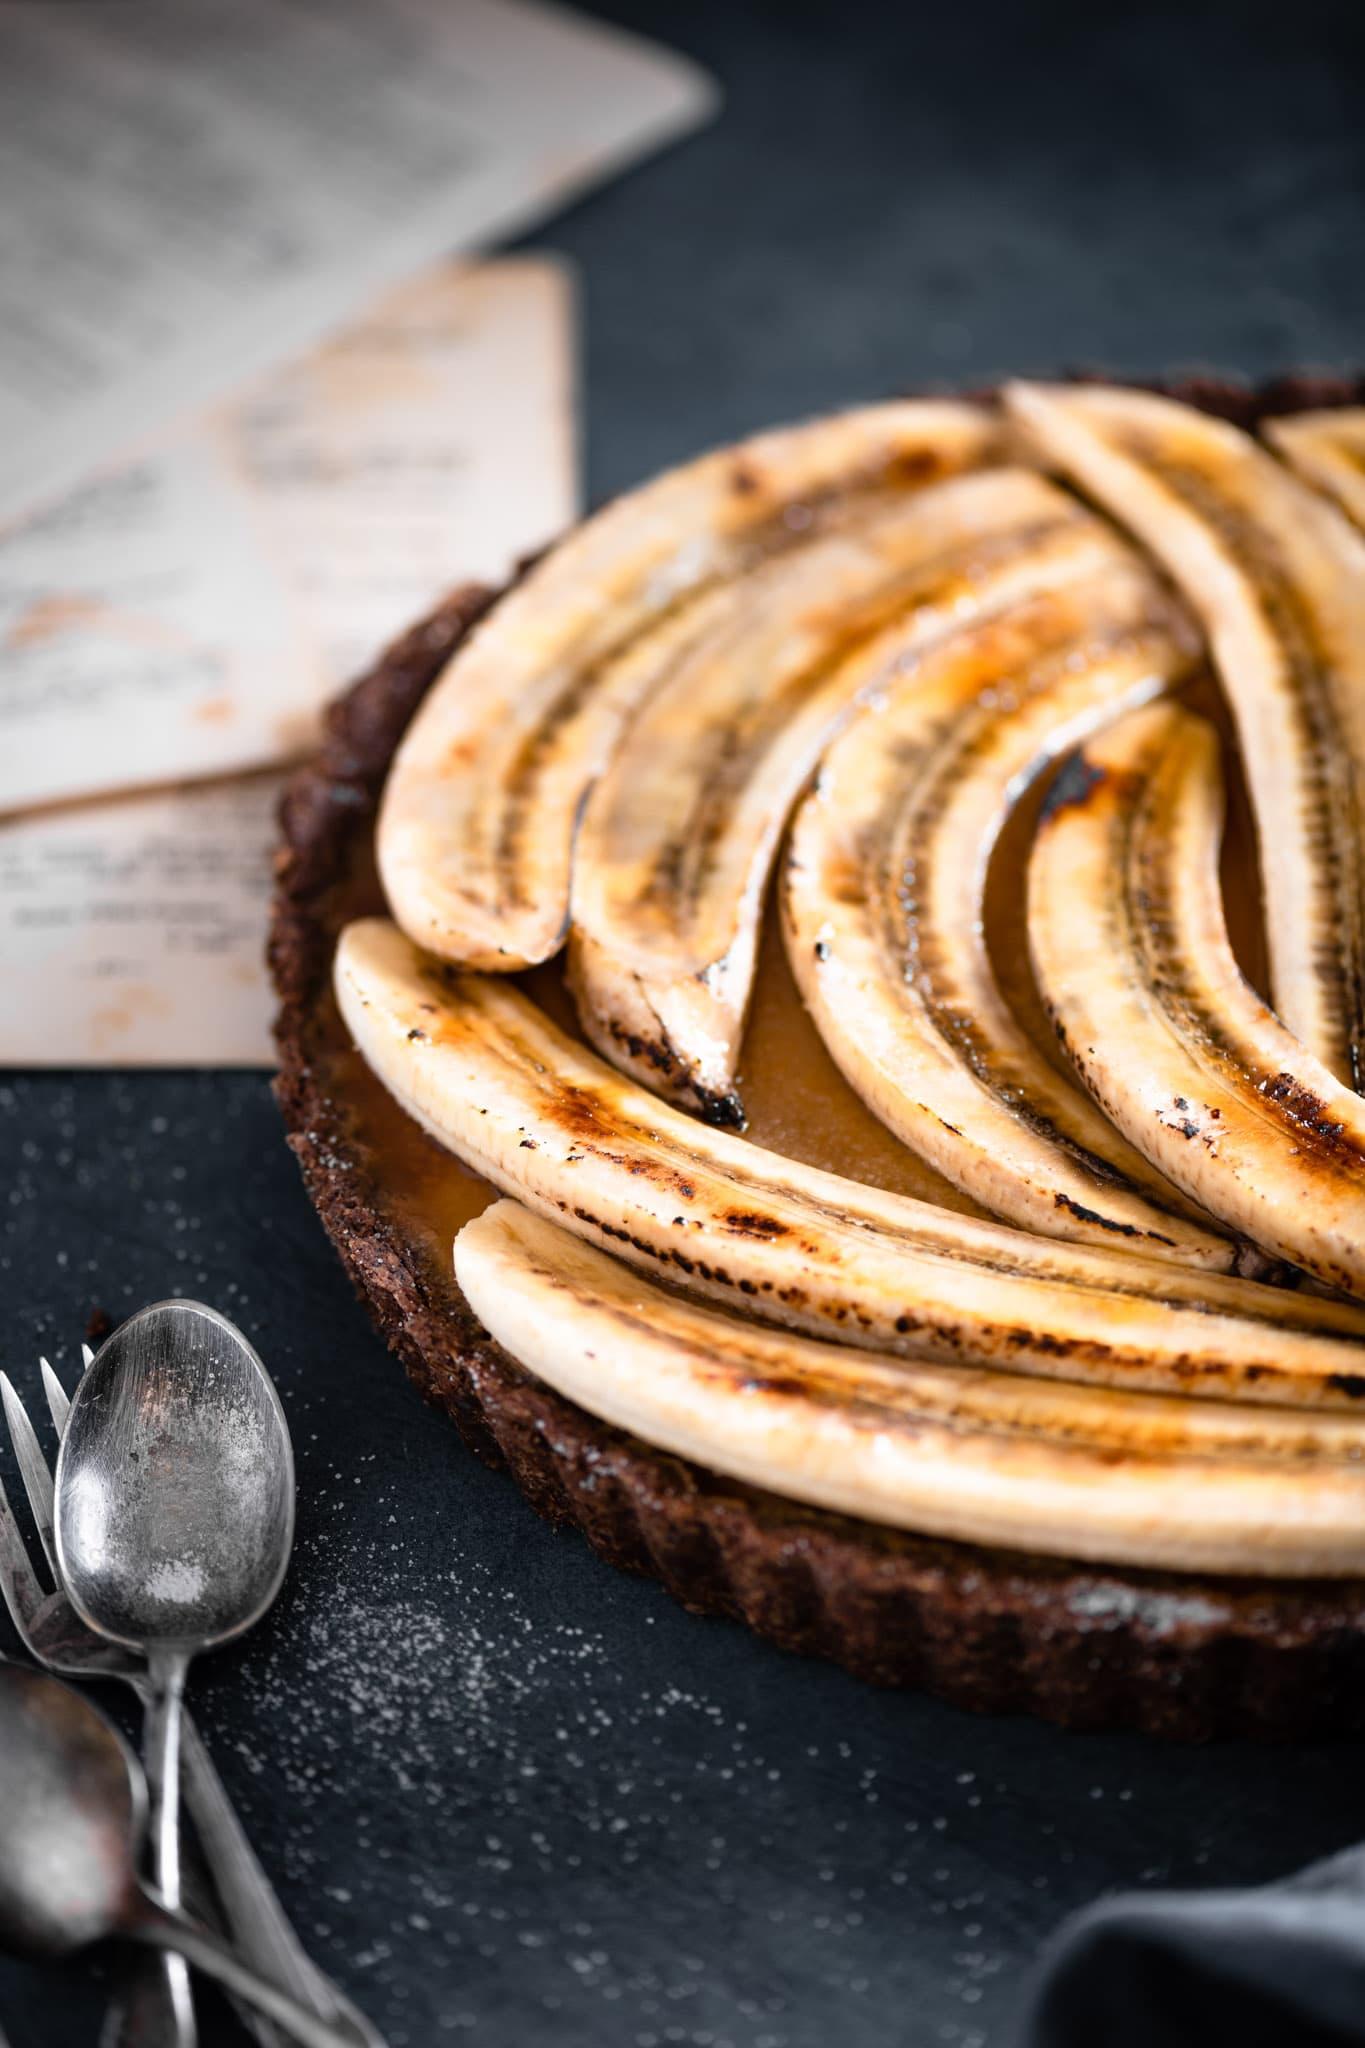 Brulee Banana on a vanilla caramel tart.